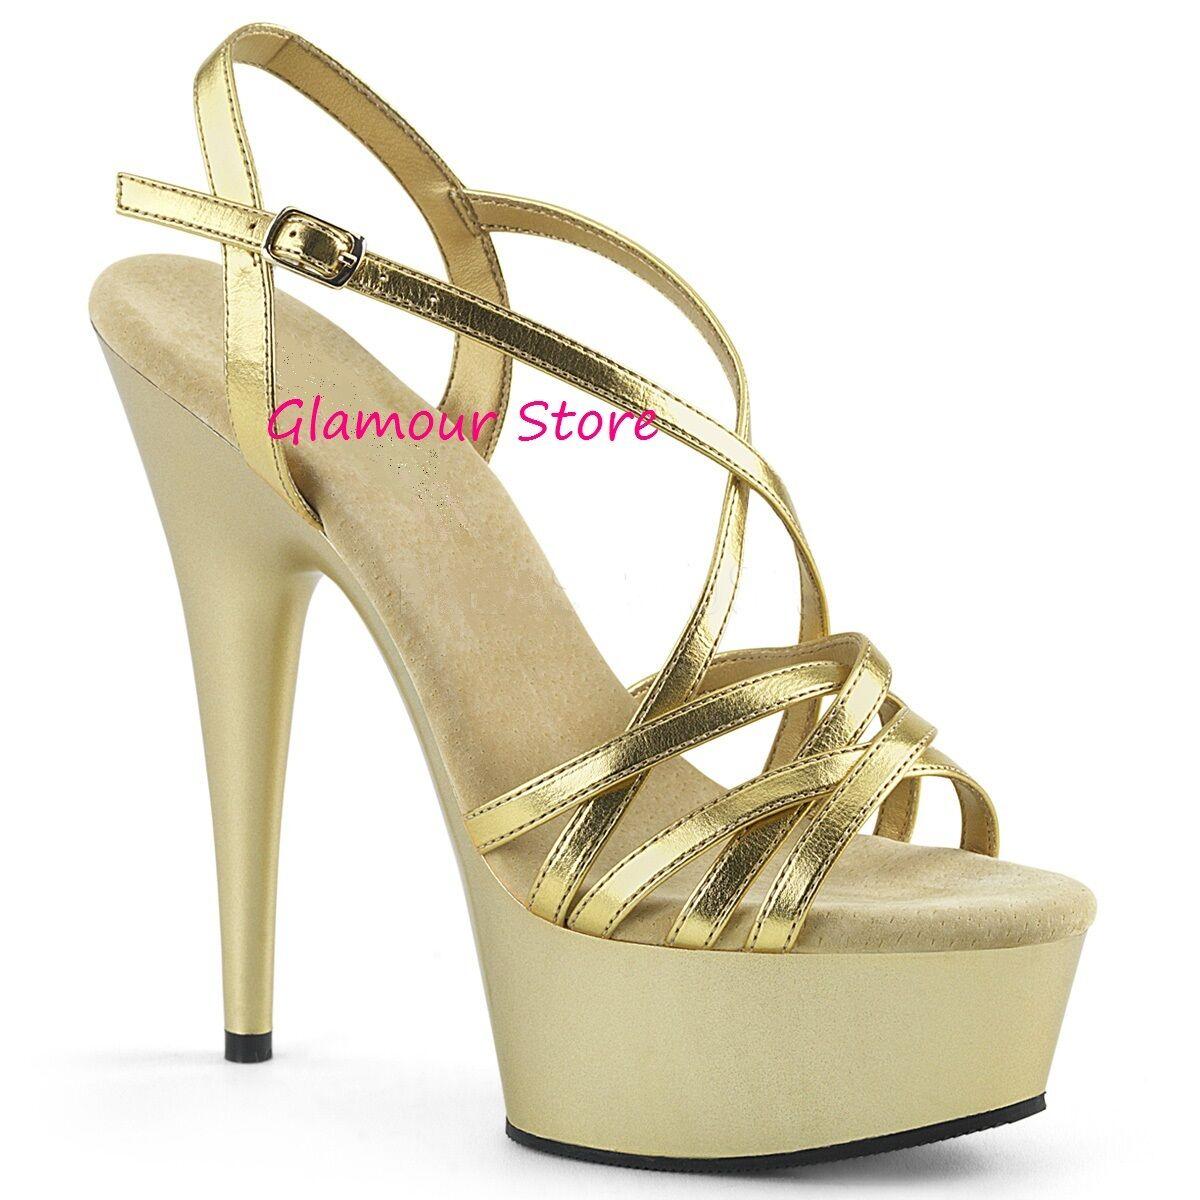 Sexy SANDALI ORO tacco 44 15 dal 35 al 44 tacco plateau cinturino scarpe GLAMOUR club 0d5973